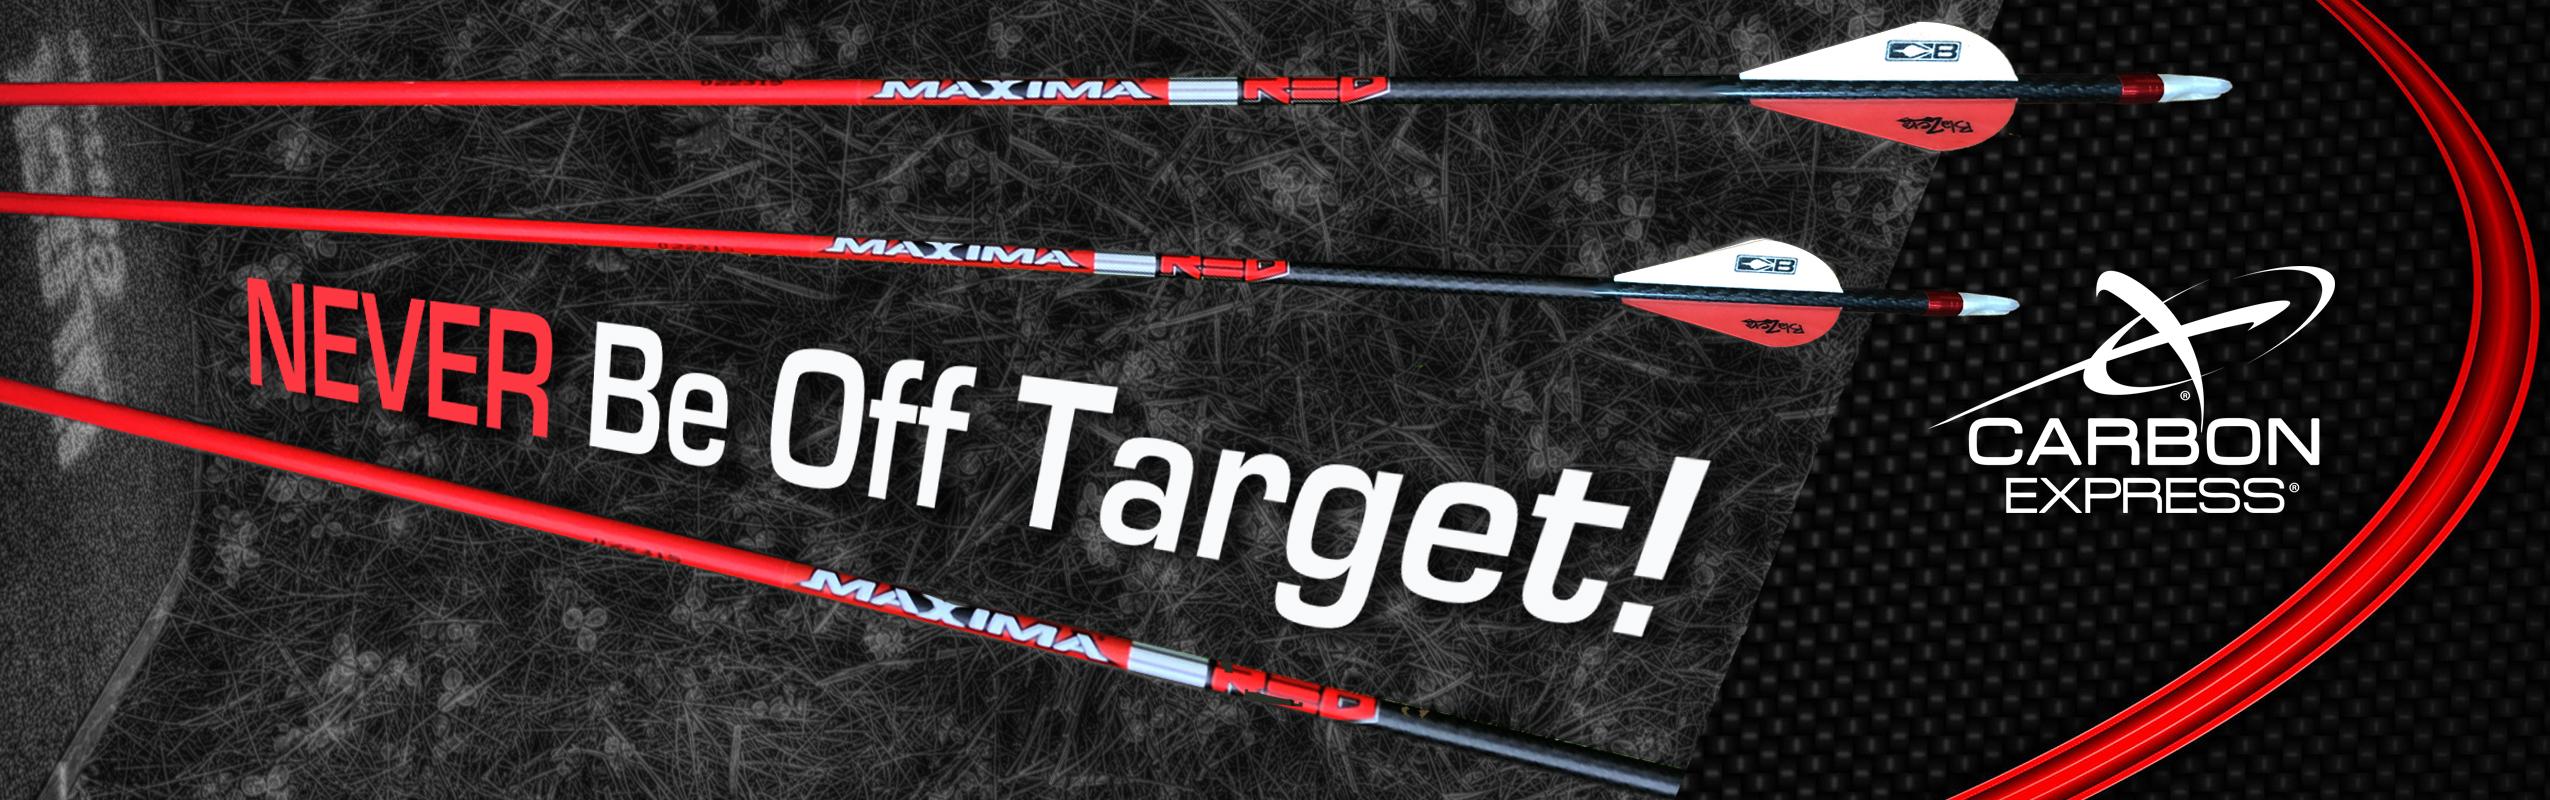 carbon-express-never-be-off-target.jpg